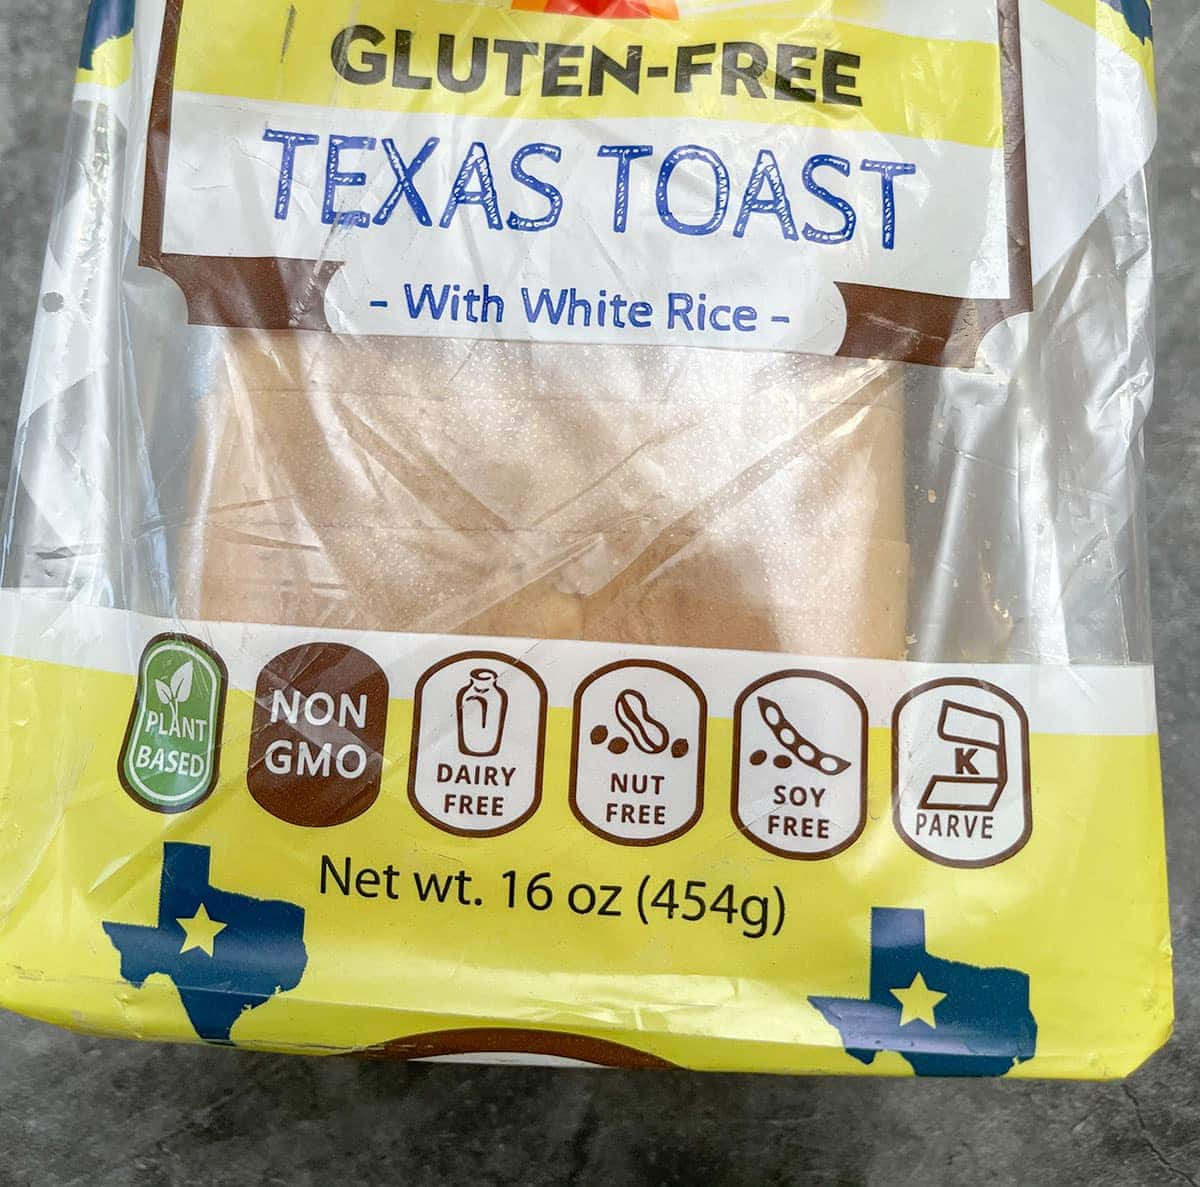 Gluten-Free Texas Toast for garlic bread